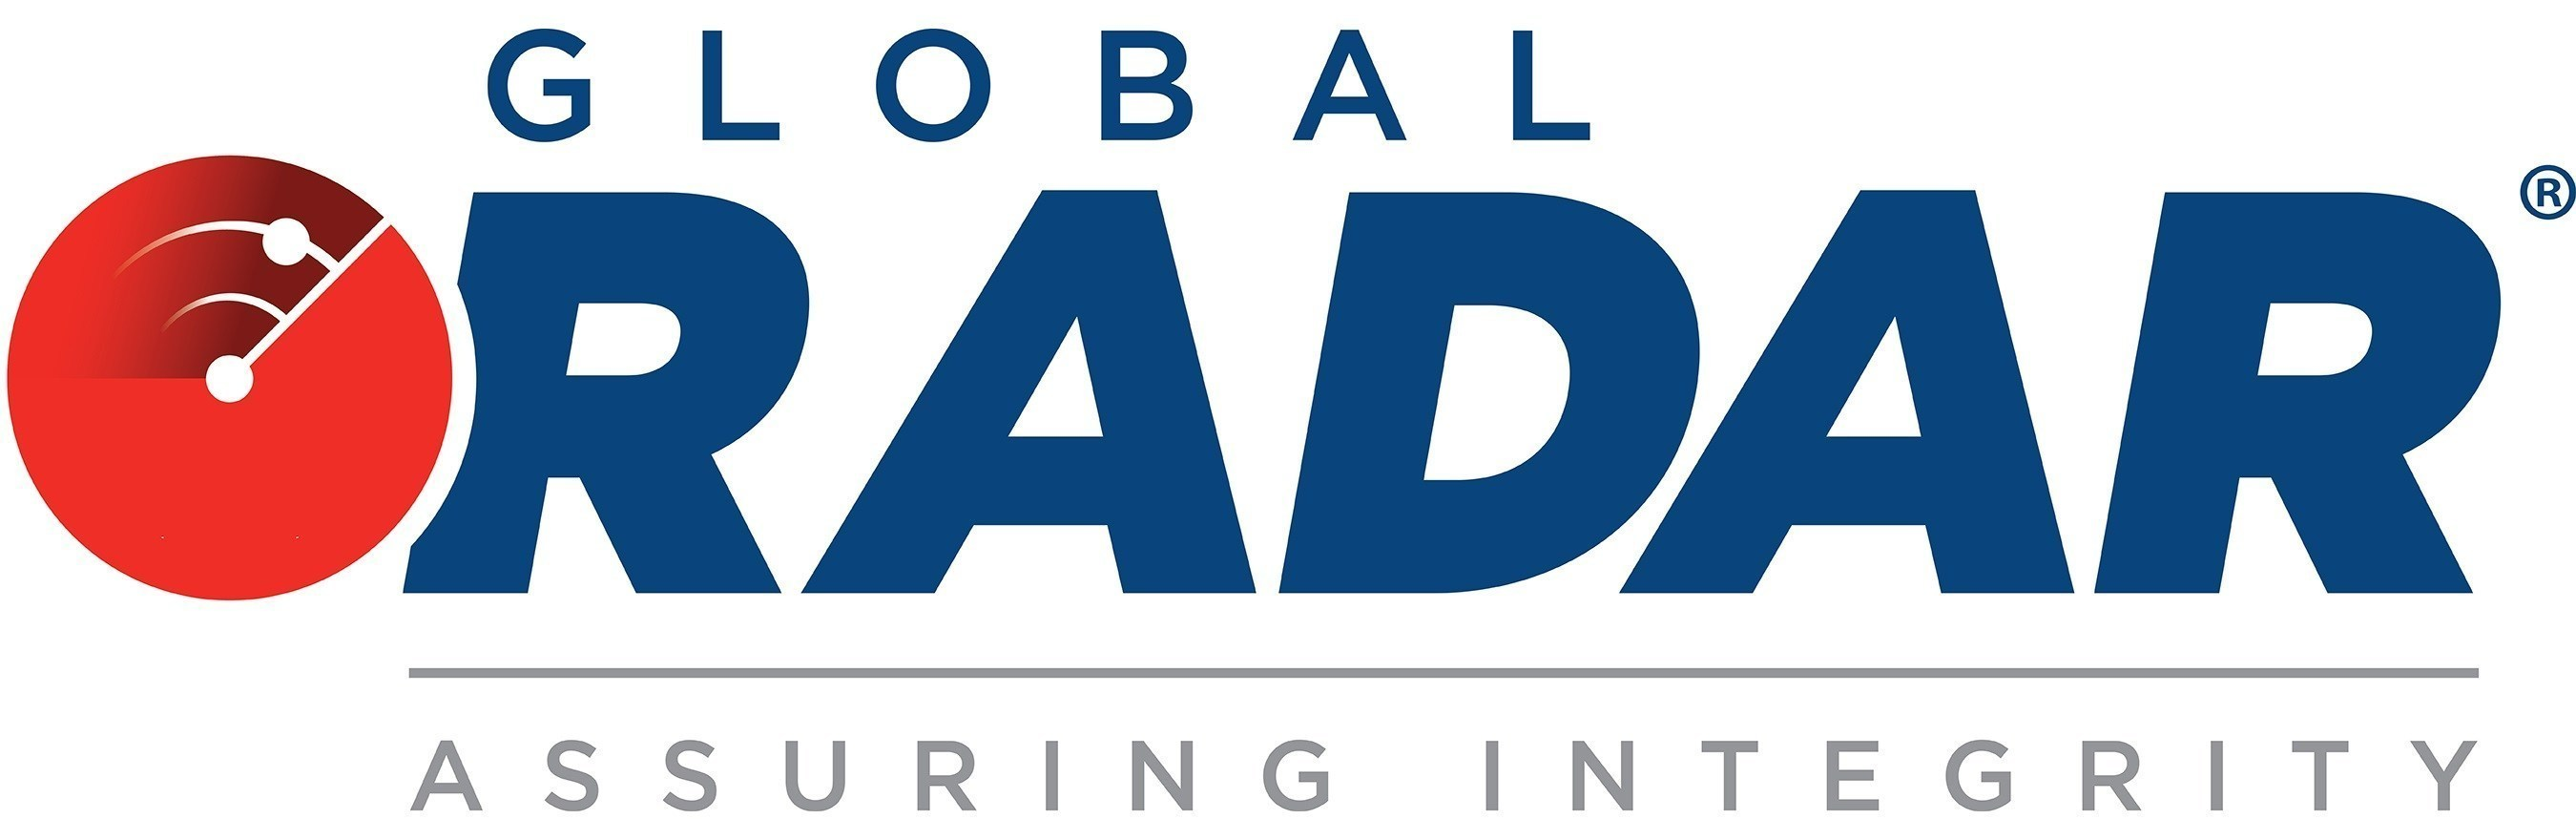 Global RADAR(R) Named Top 10 Risk & Compliance Solutions Provider